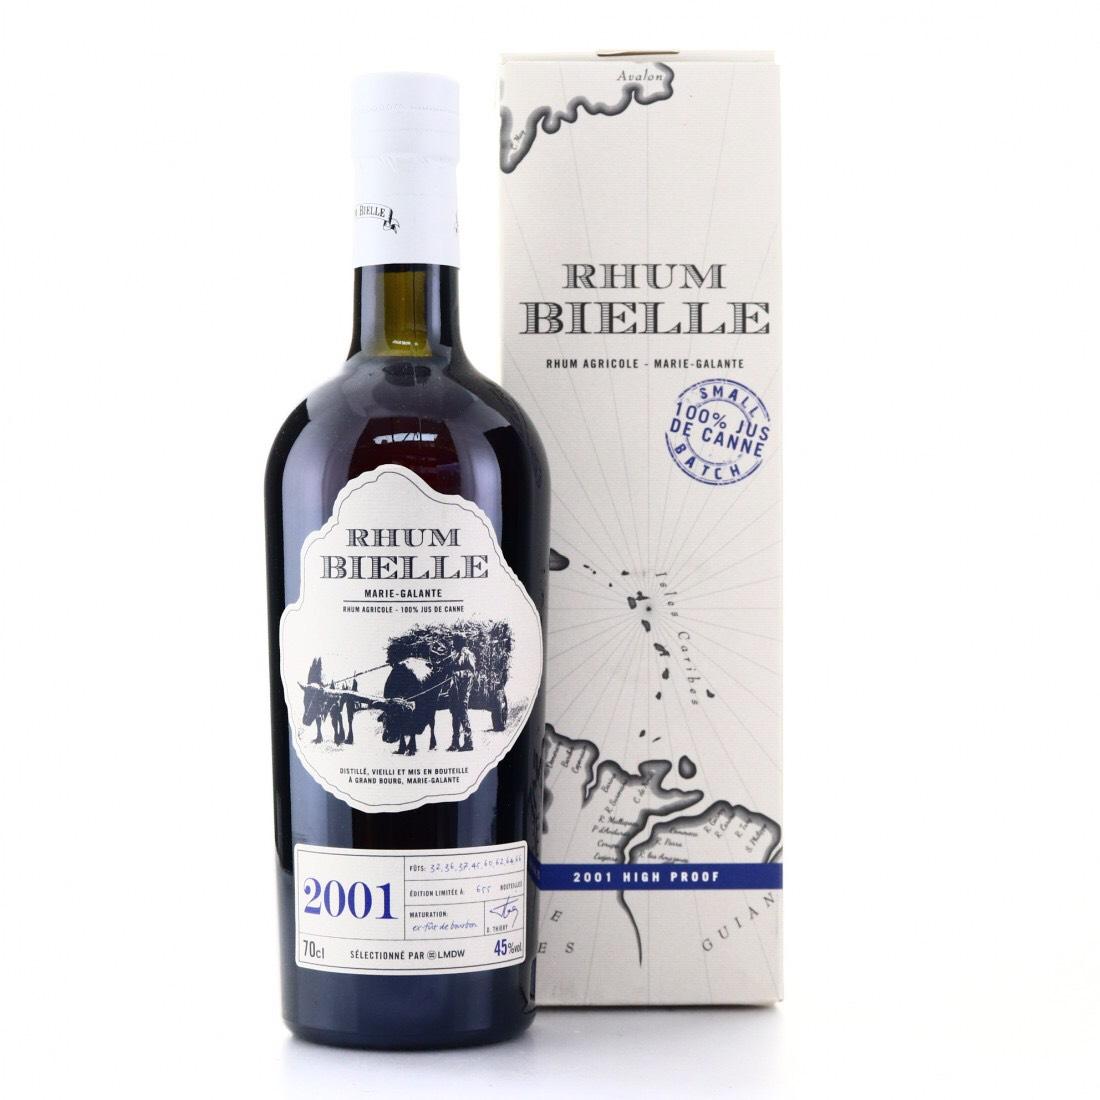 Bottle image of LMDW